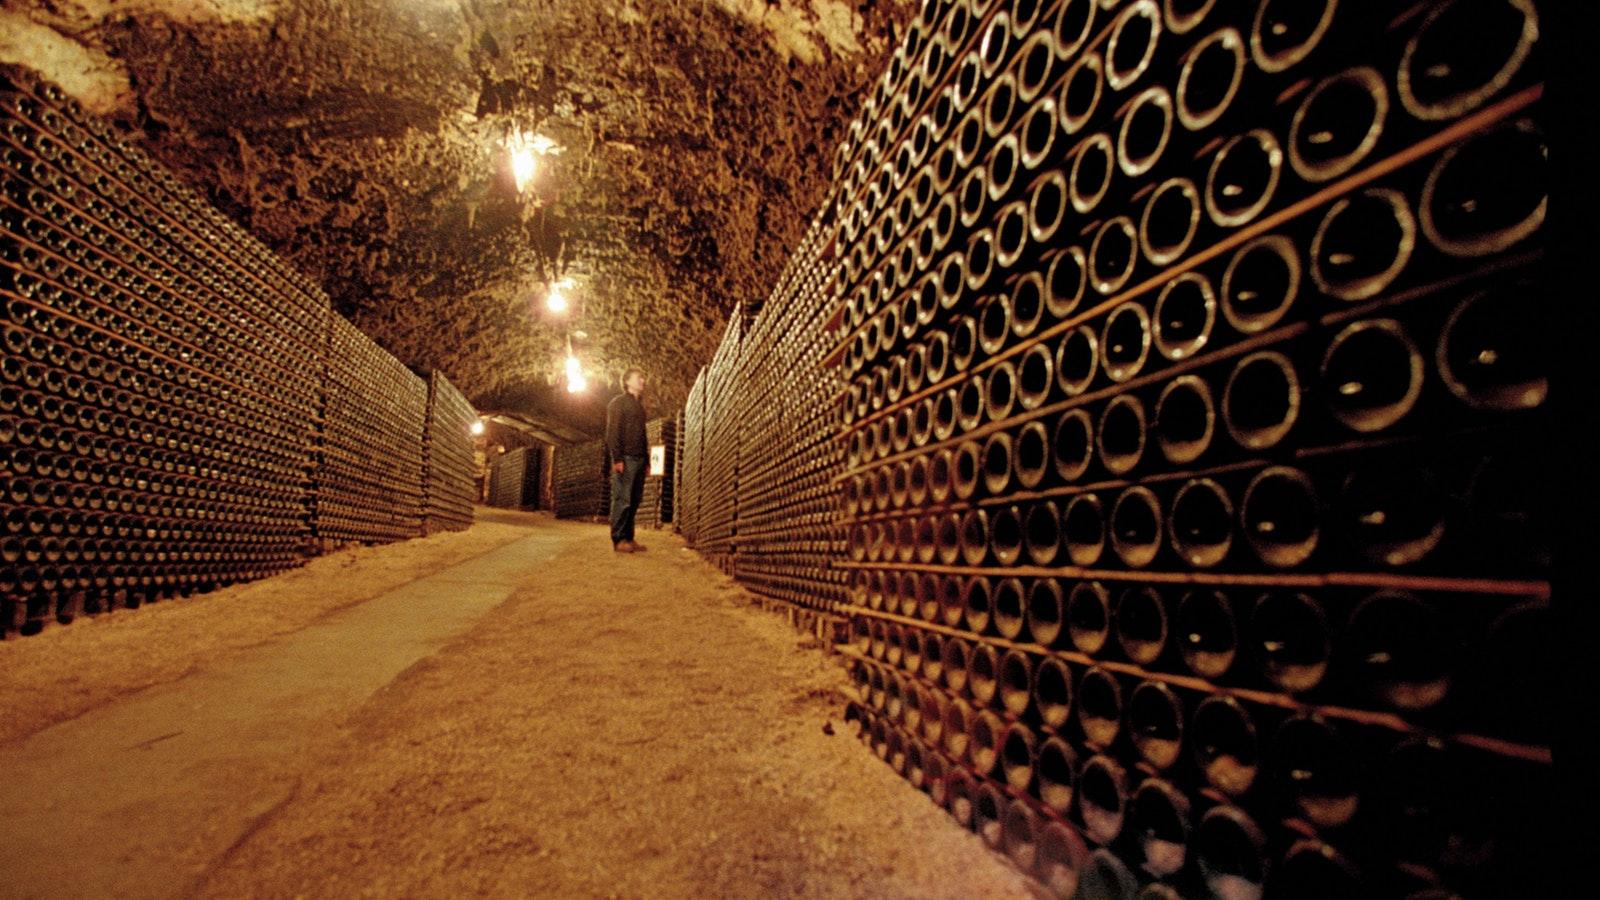 Bests wine cellar